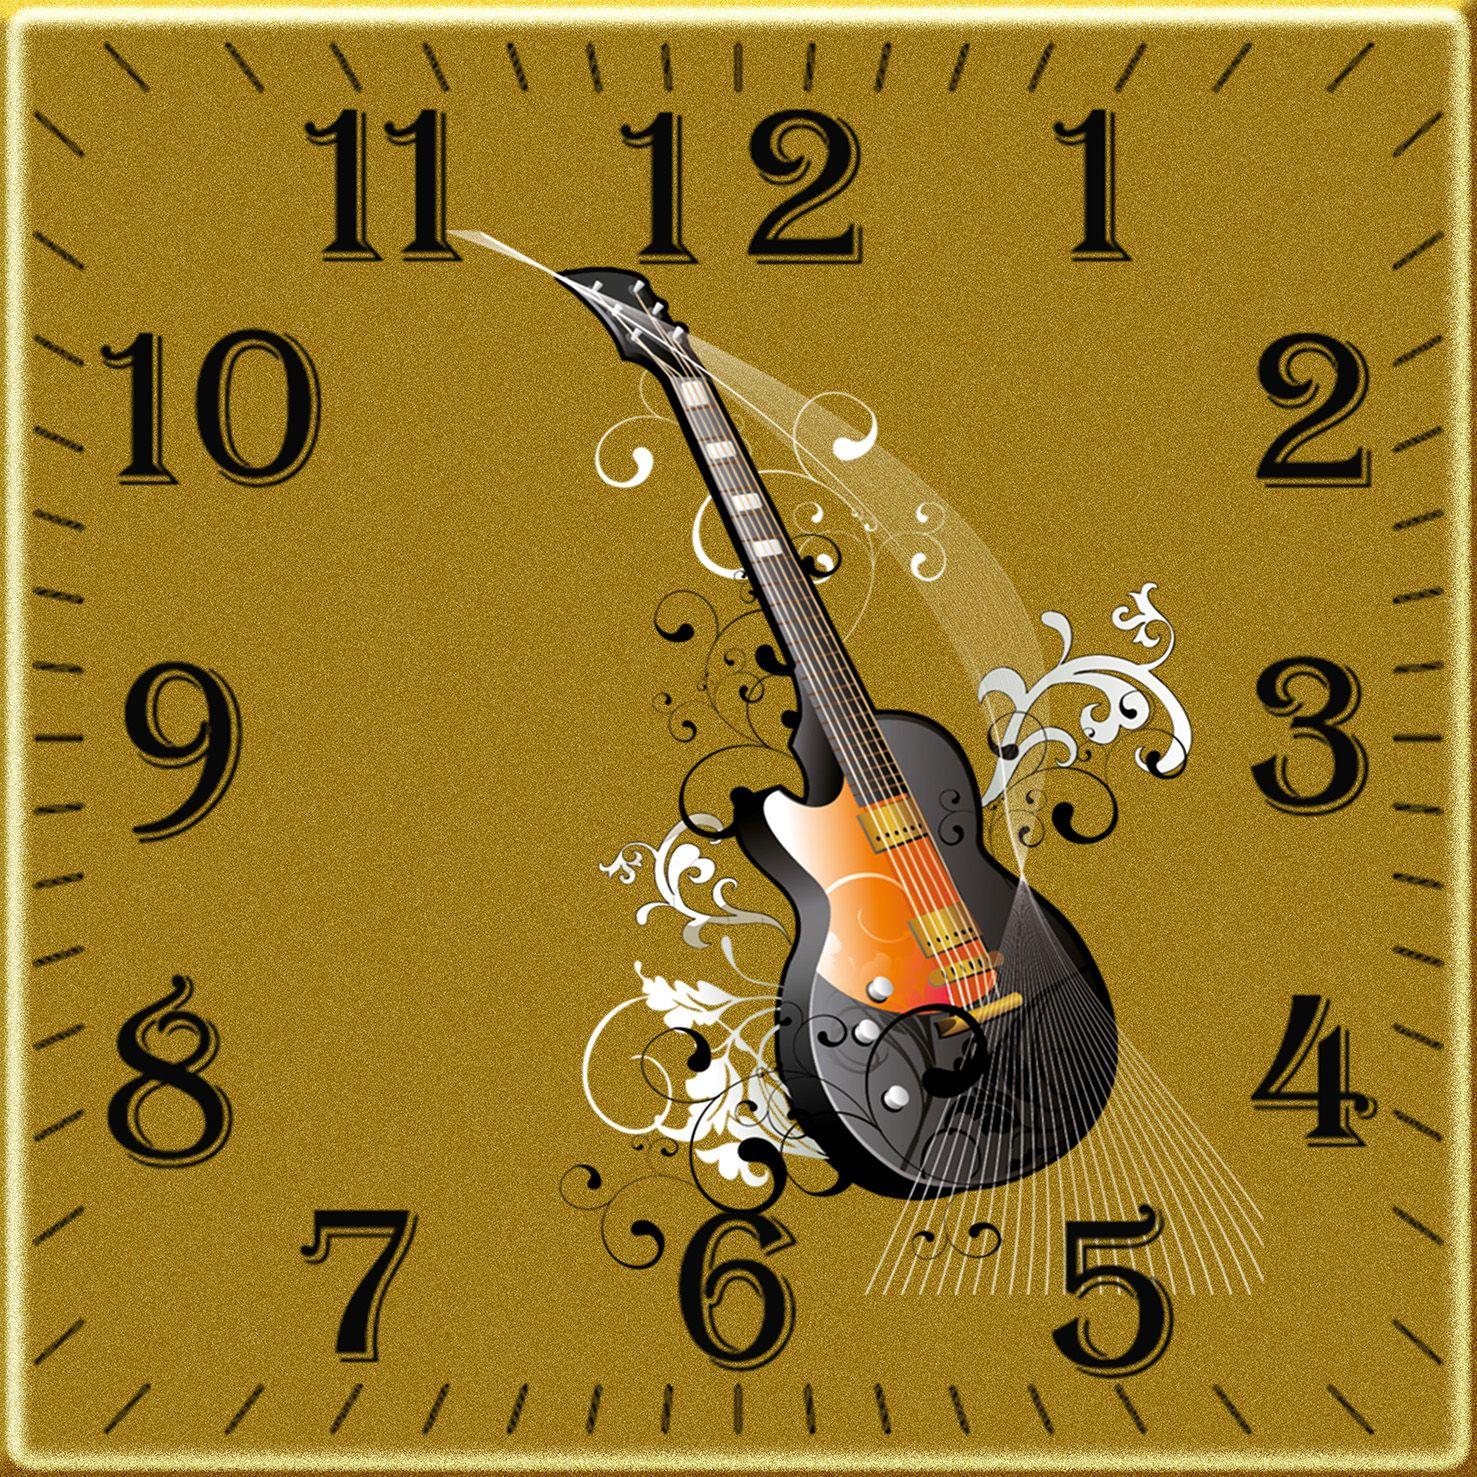 Pin by Нина Печенина on Собранные циферблаты | Pinterest | Clocks ...